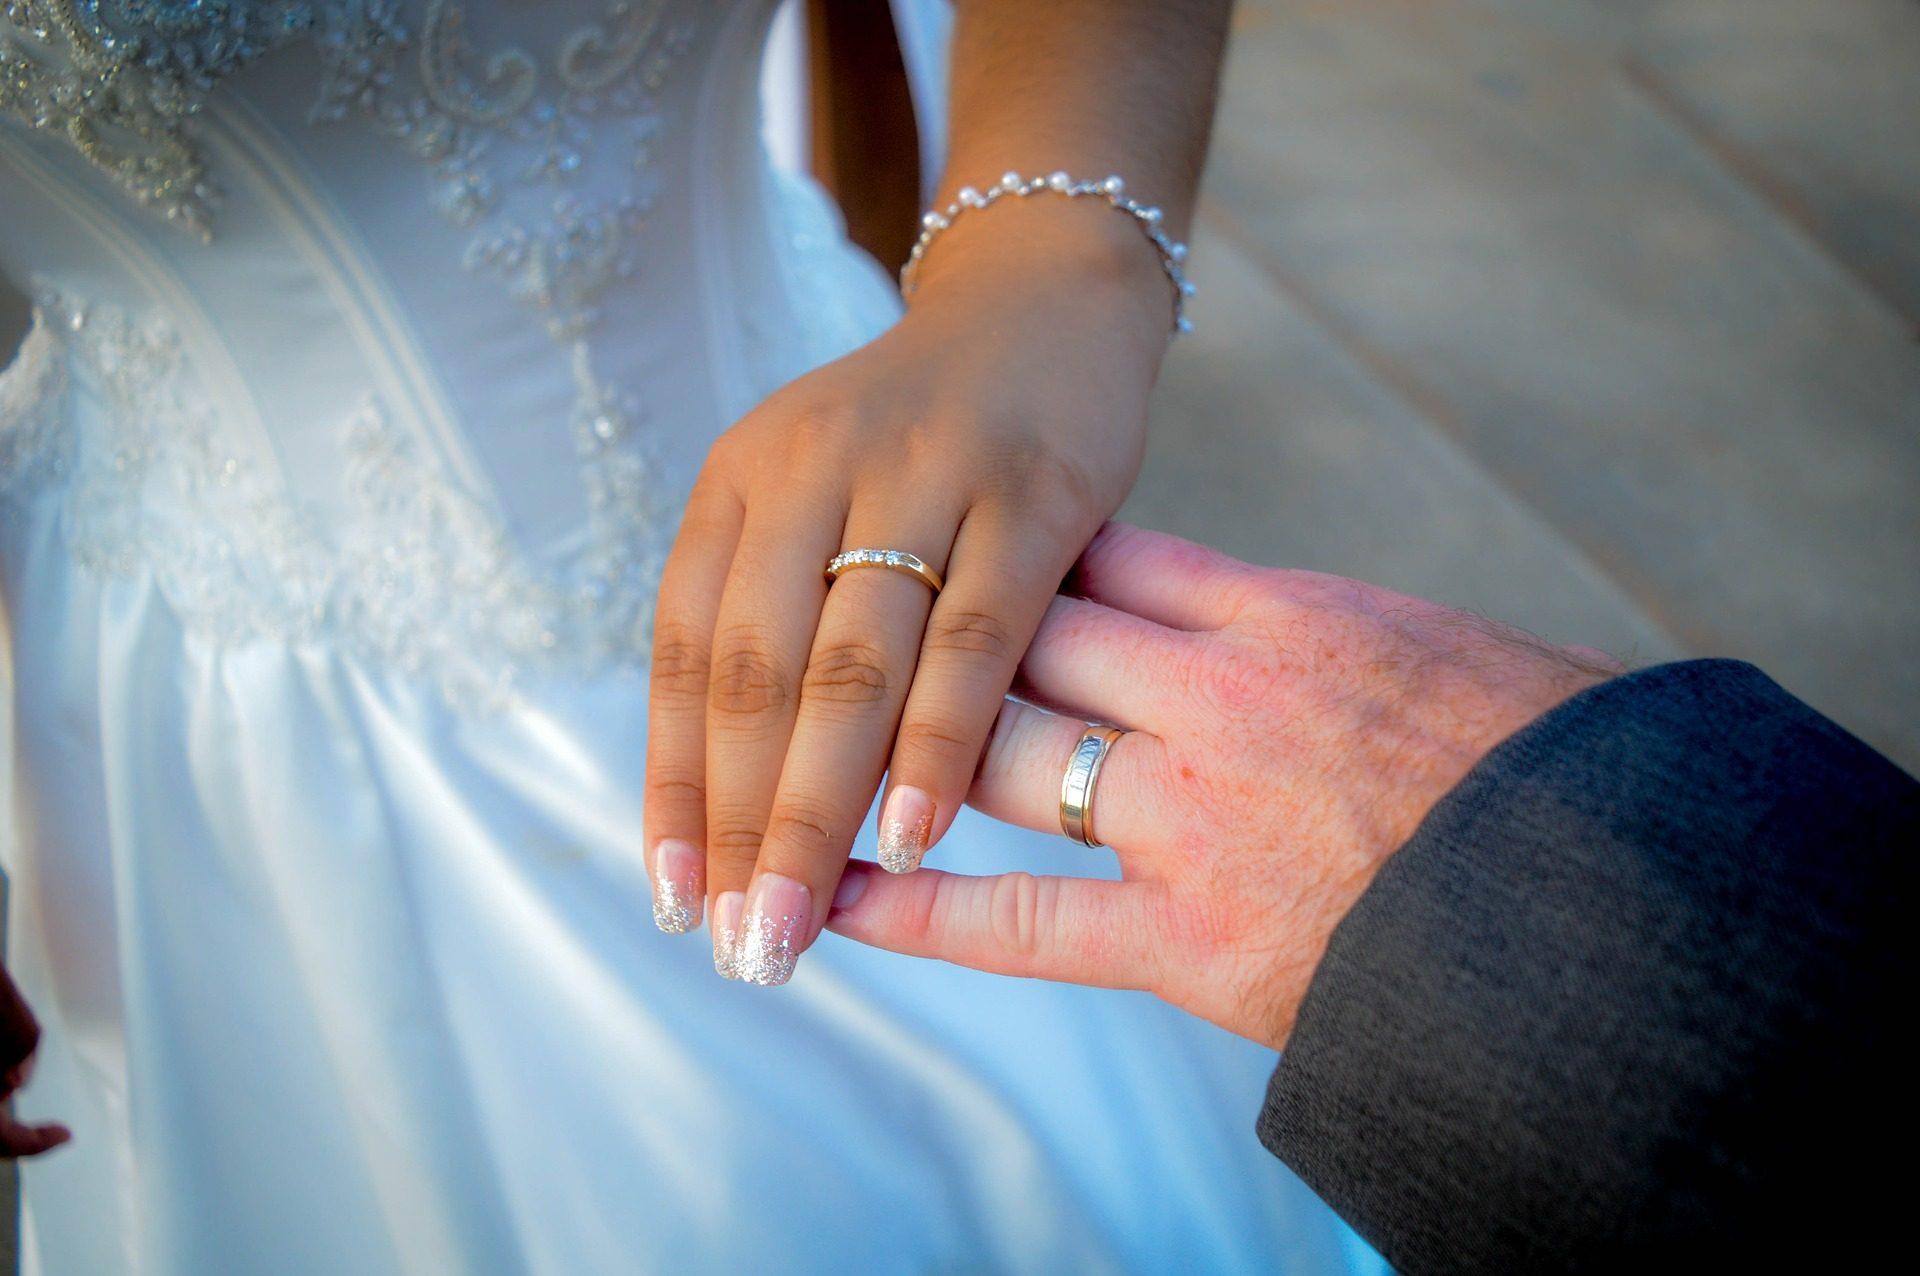 بالصور خلفيات زواج , صور خلفيات مميزه لا مثيل لها لاجمل عروسين 3626 9